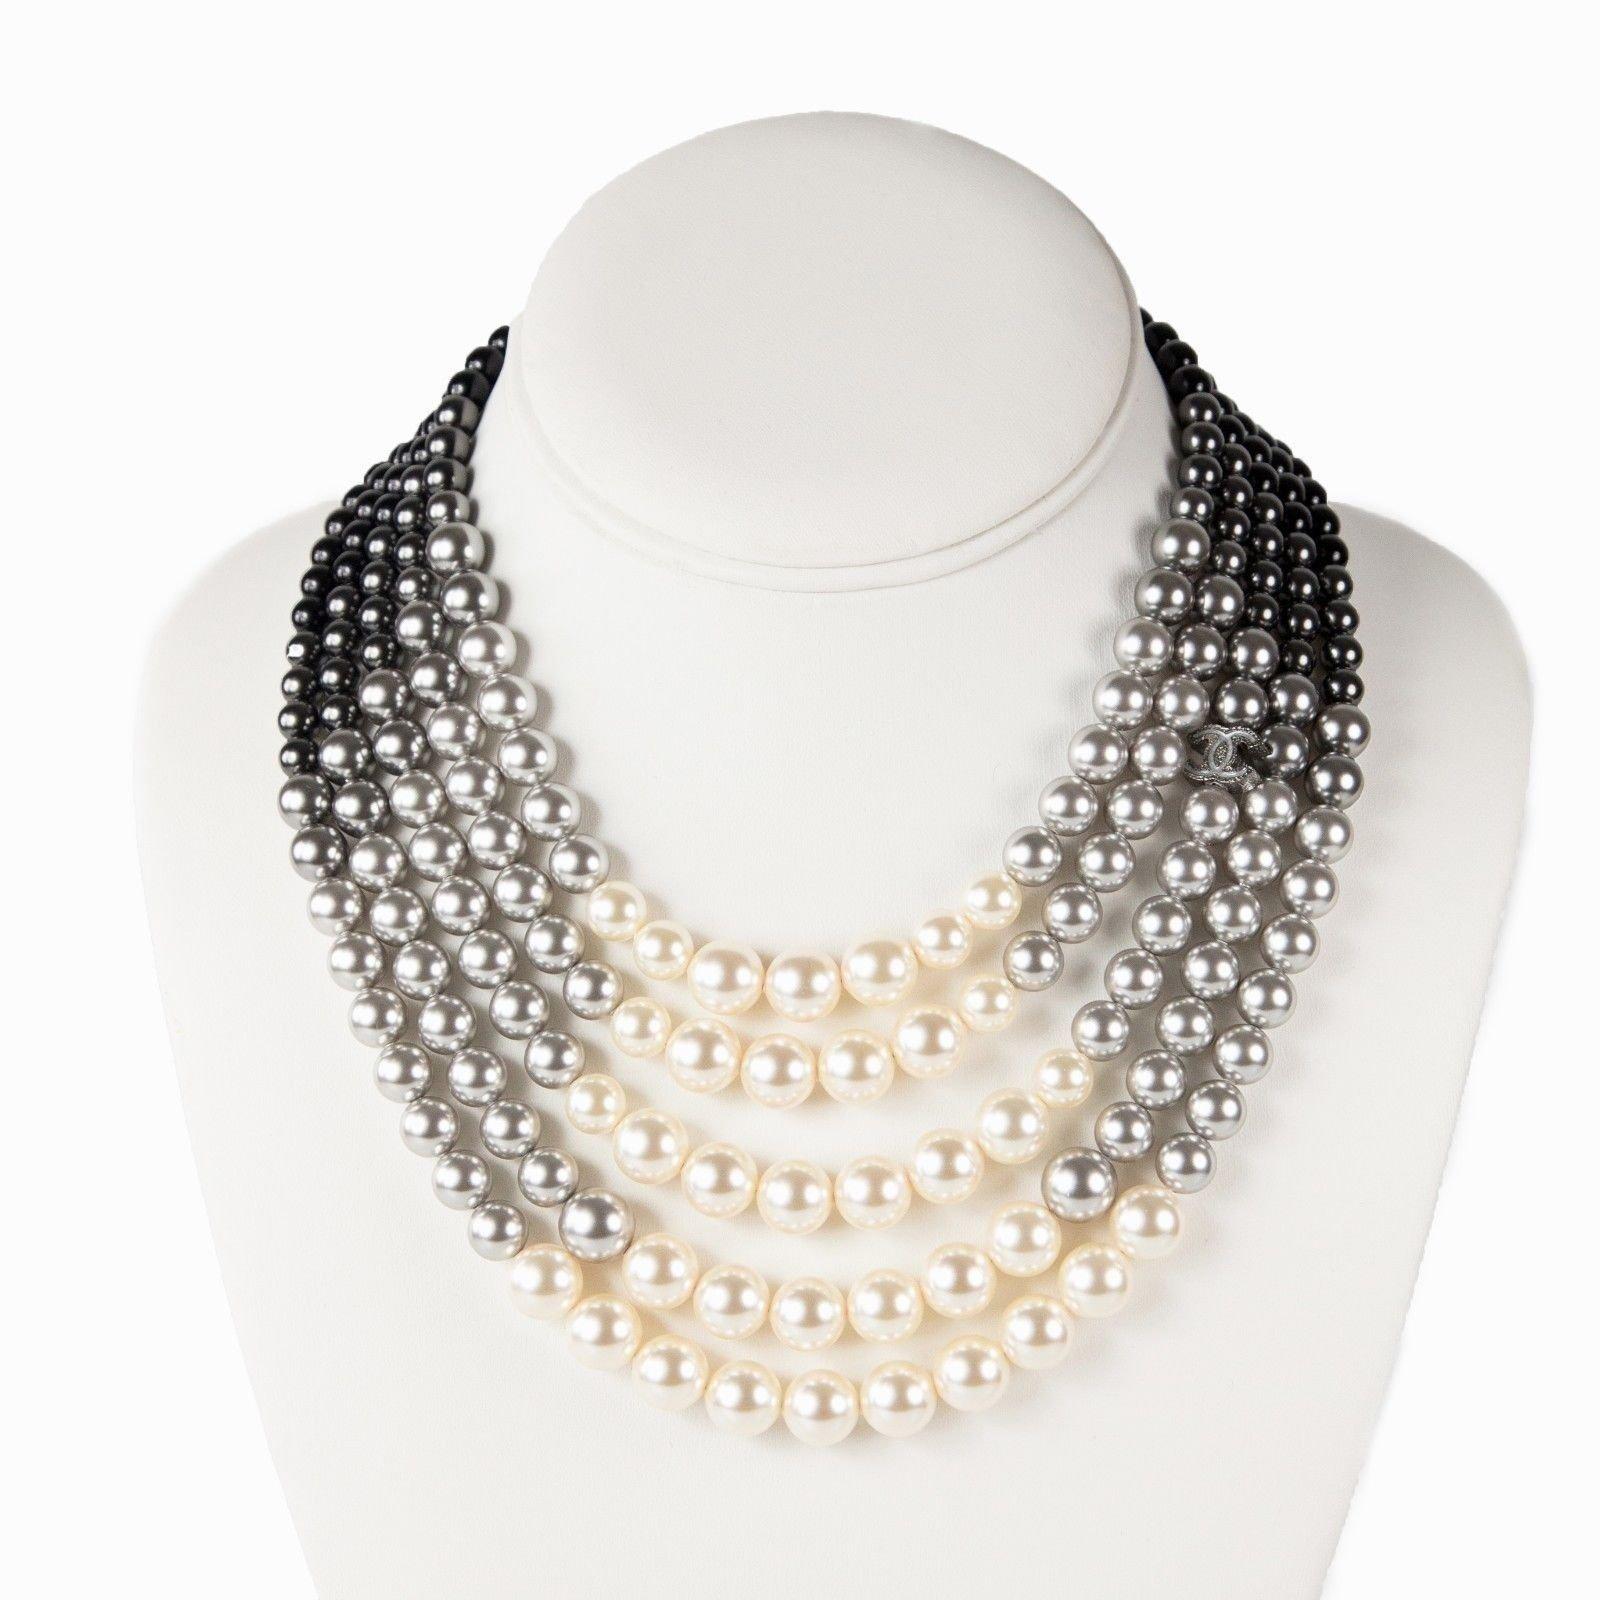 50531ee8cad8 Colliers Chanel Perle Multirang Collier dégradé Perle Multicolore ref.37037